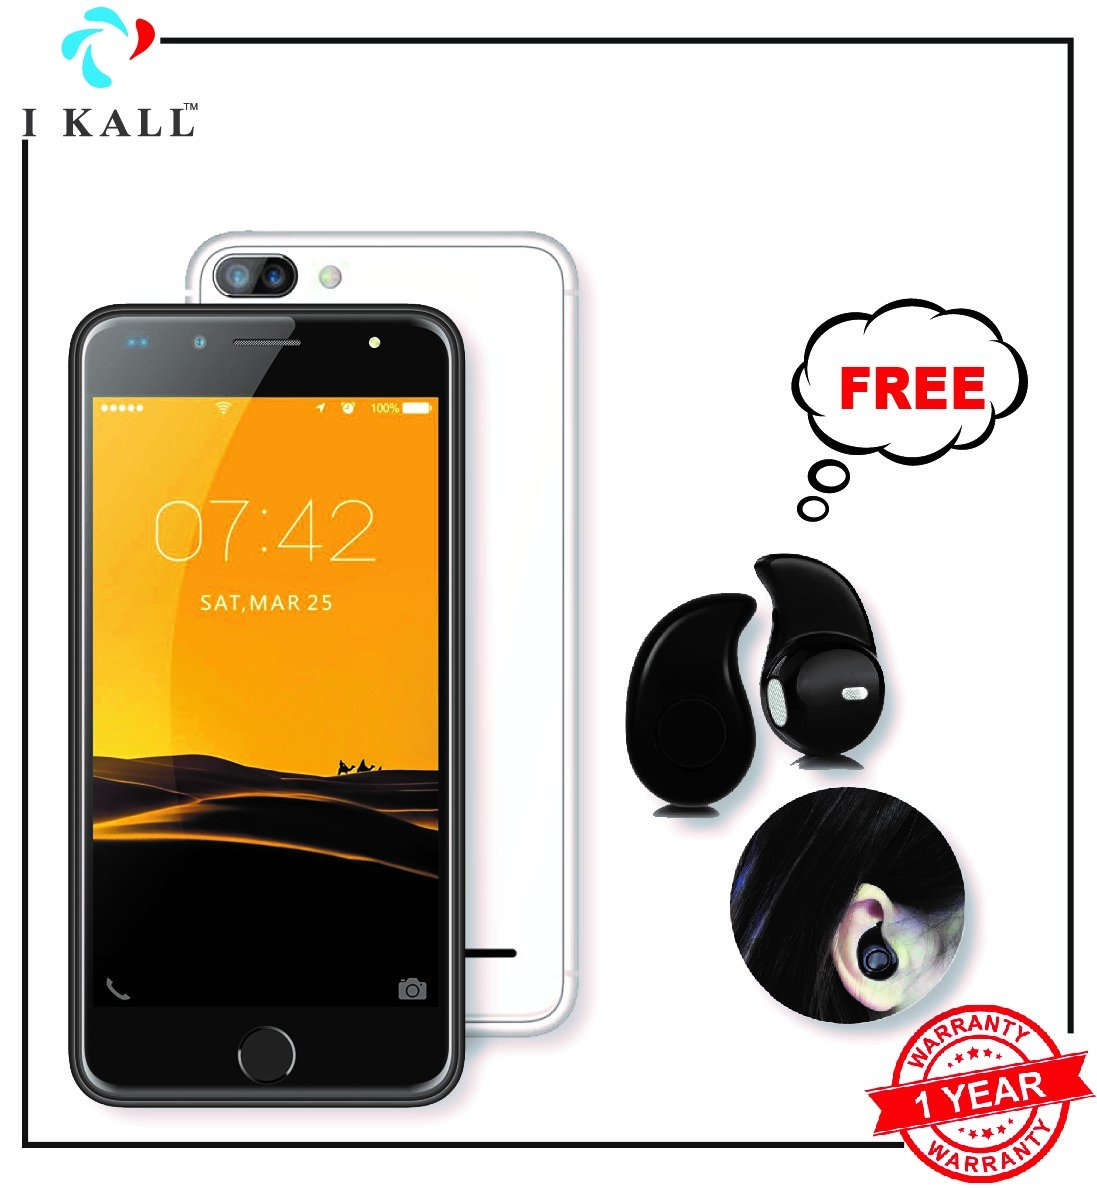 IKALL K1 5 Inch Display (1+8GB) 4G Volte Smart Phone With Freebie Bluetooth Ear-Pod (Silver)